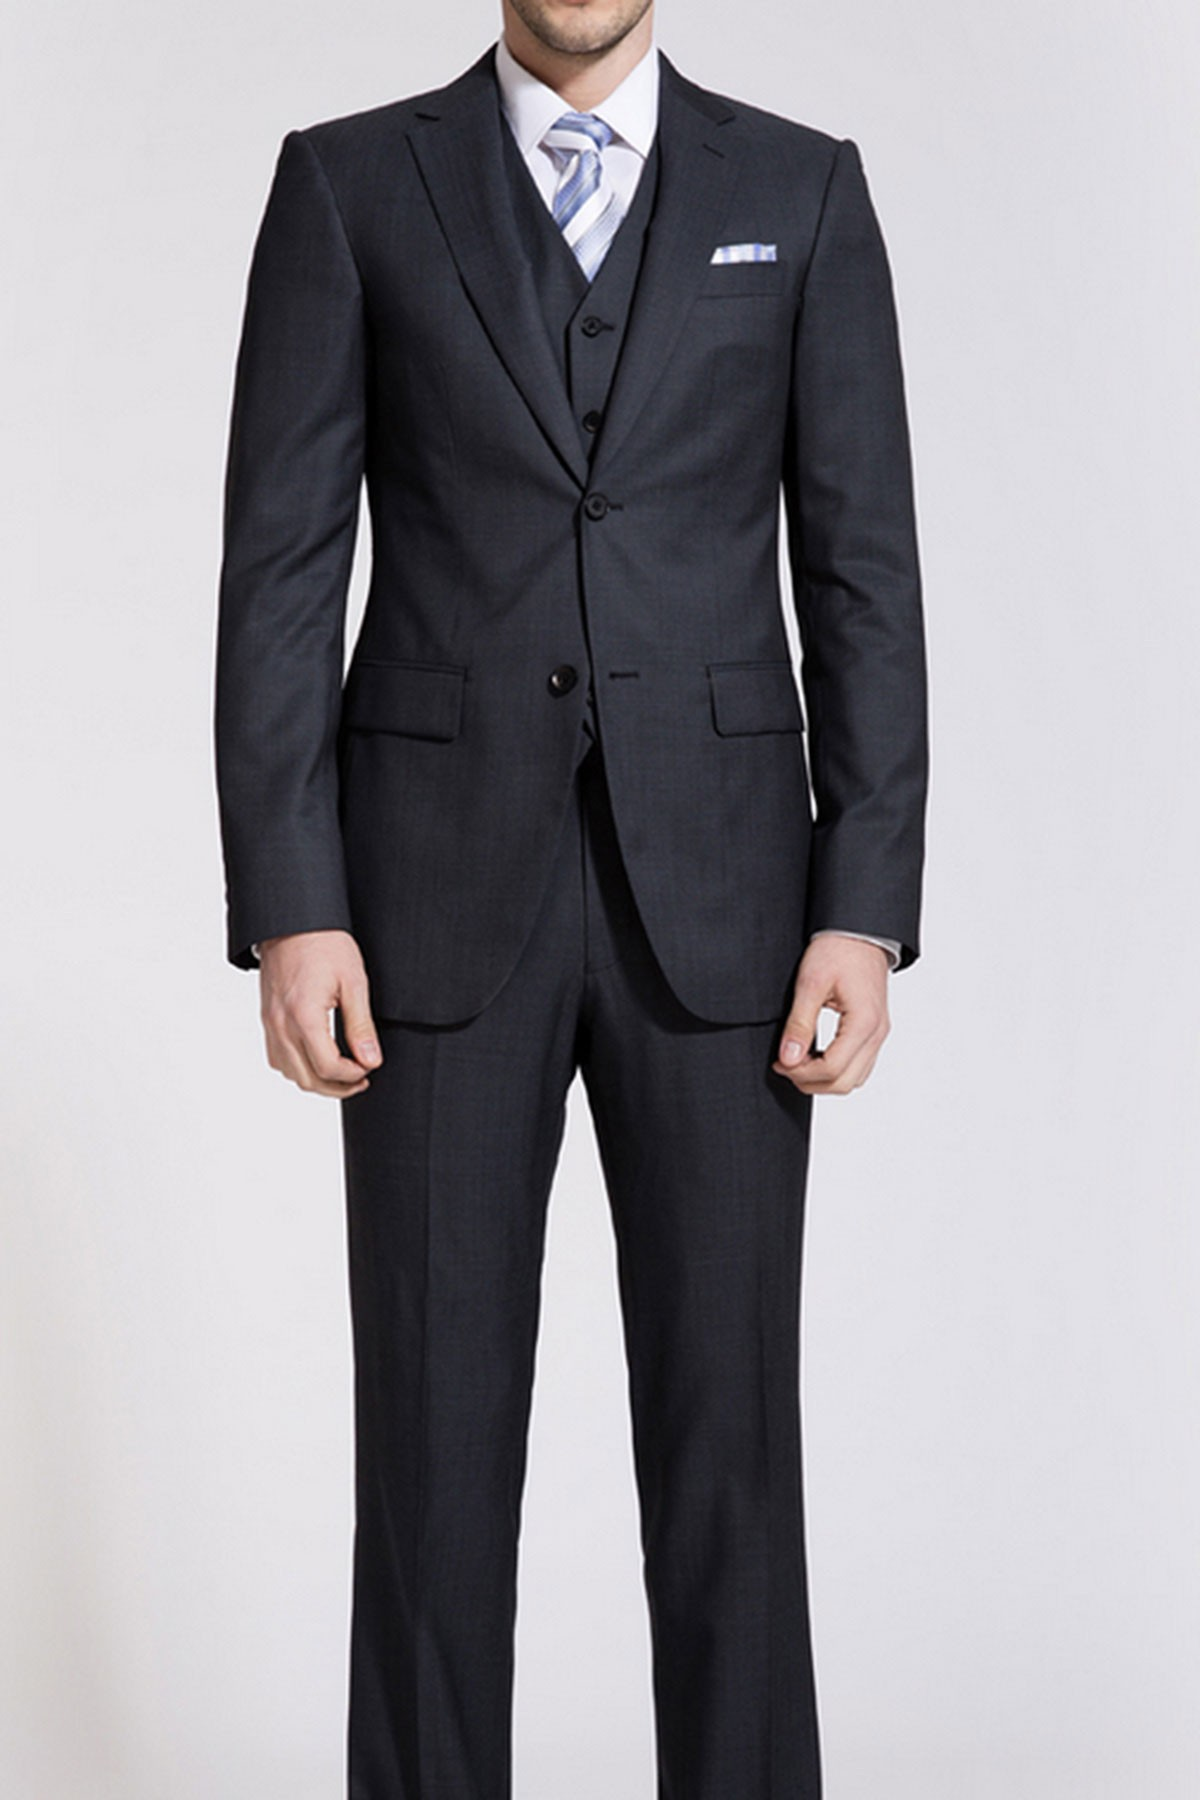 Windsor Black Reda Two-Piece Suit ID-171